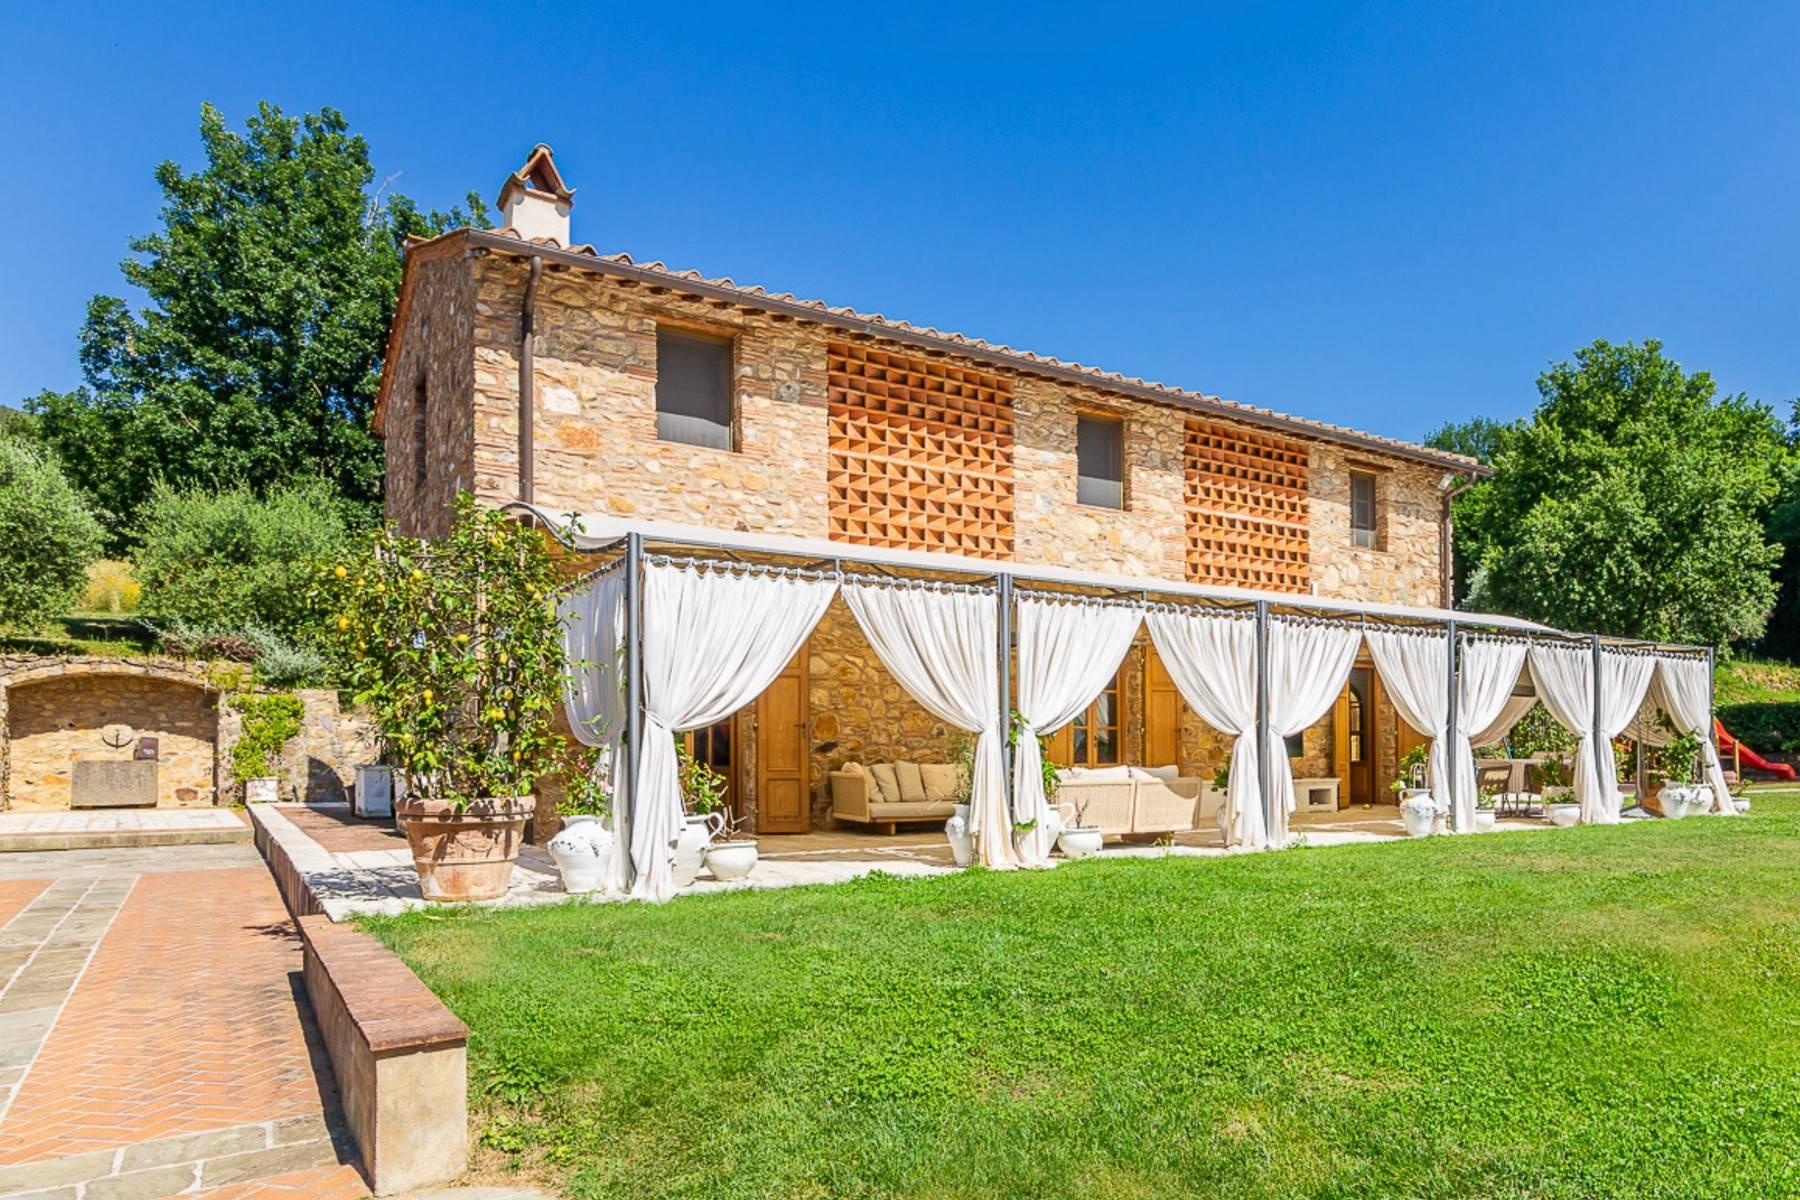 Villa in Vendita a Lucca: 5 locali, 1130 mq - Foto 22